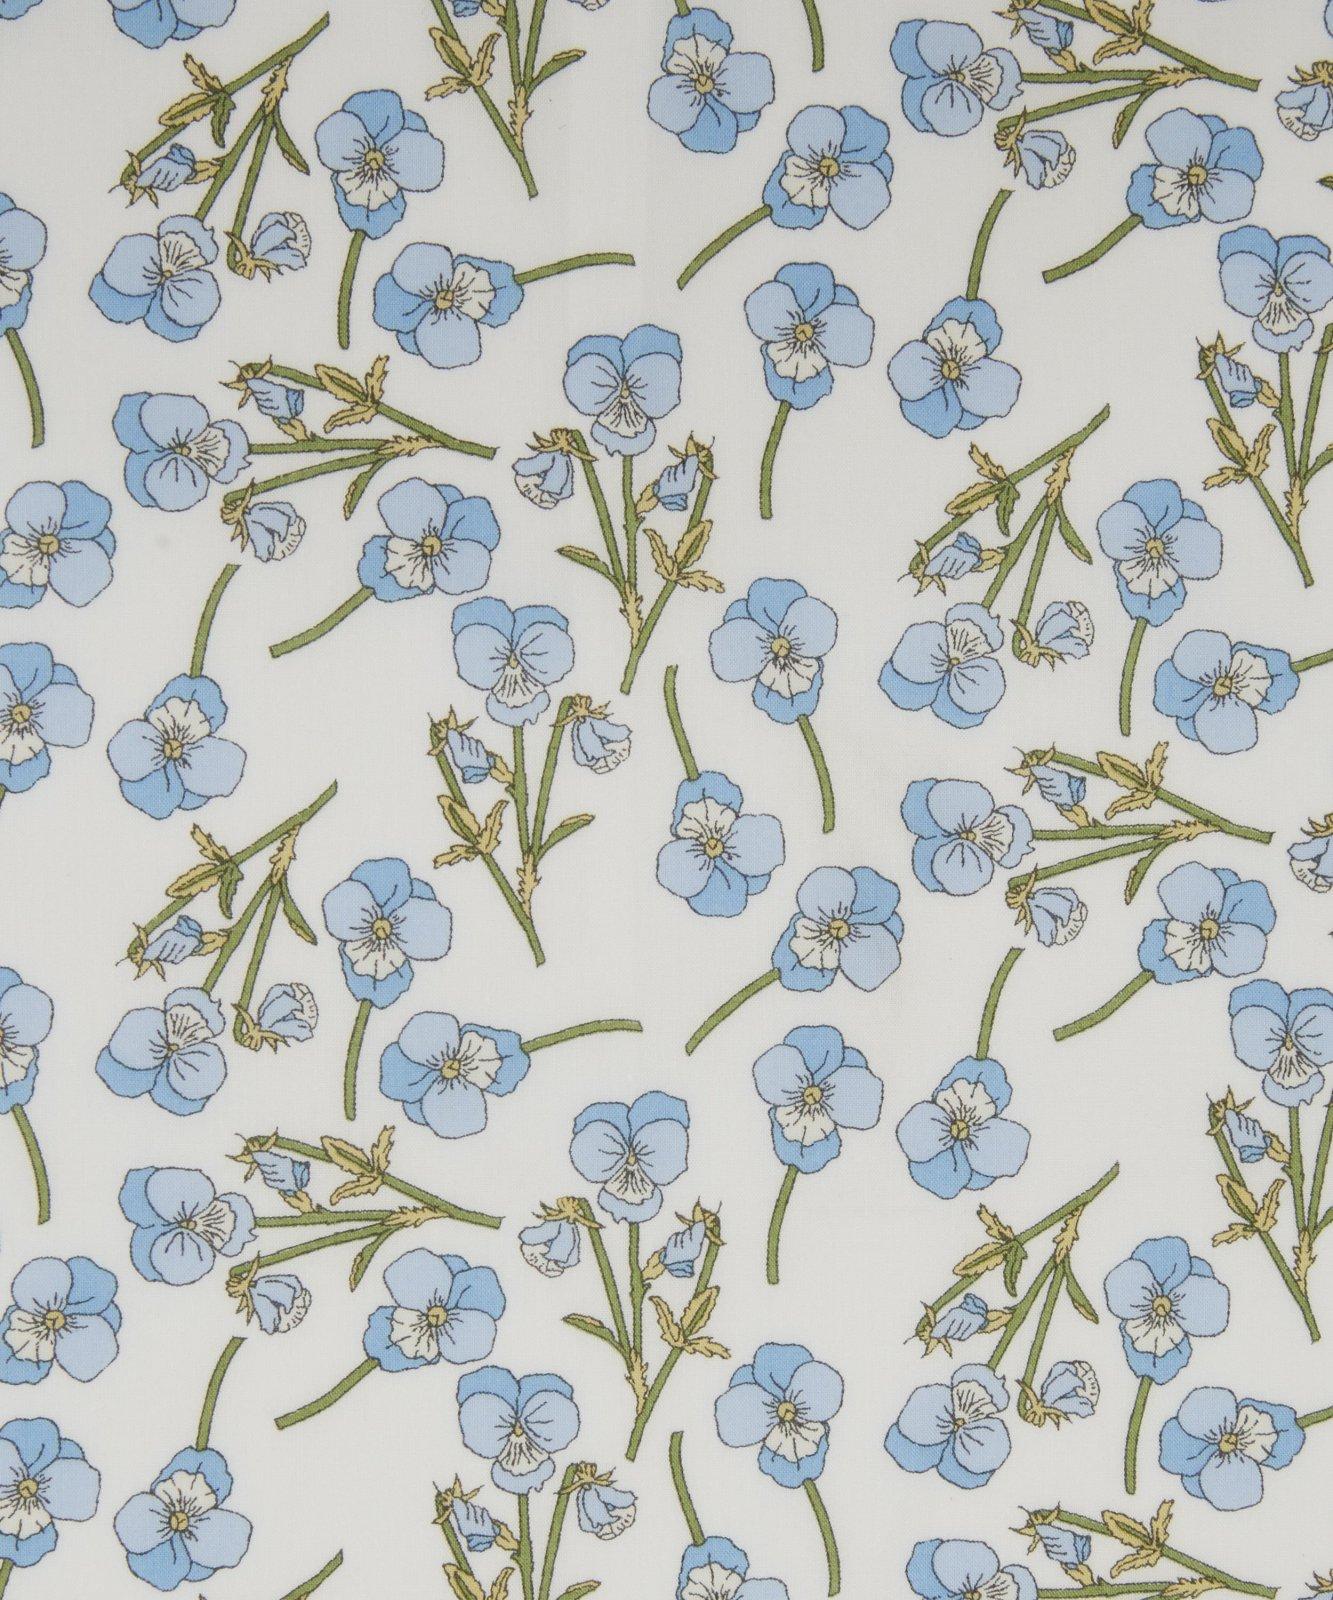 Ros K Liberty of London Tana Lawn Fabric Light Blue on White